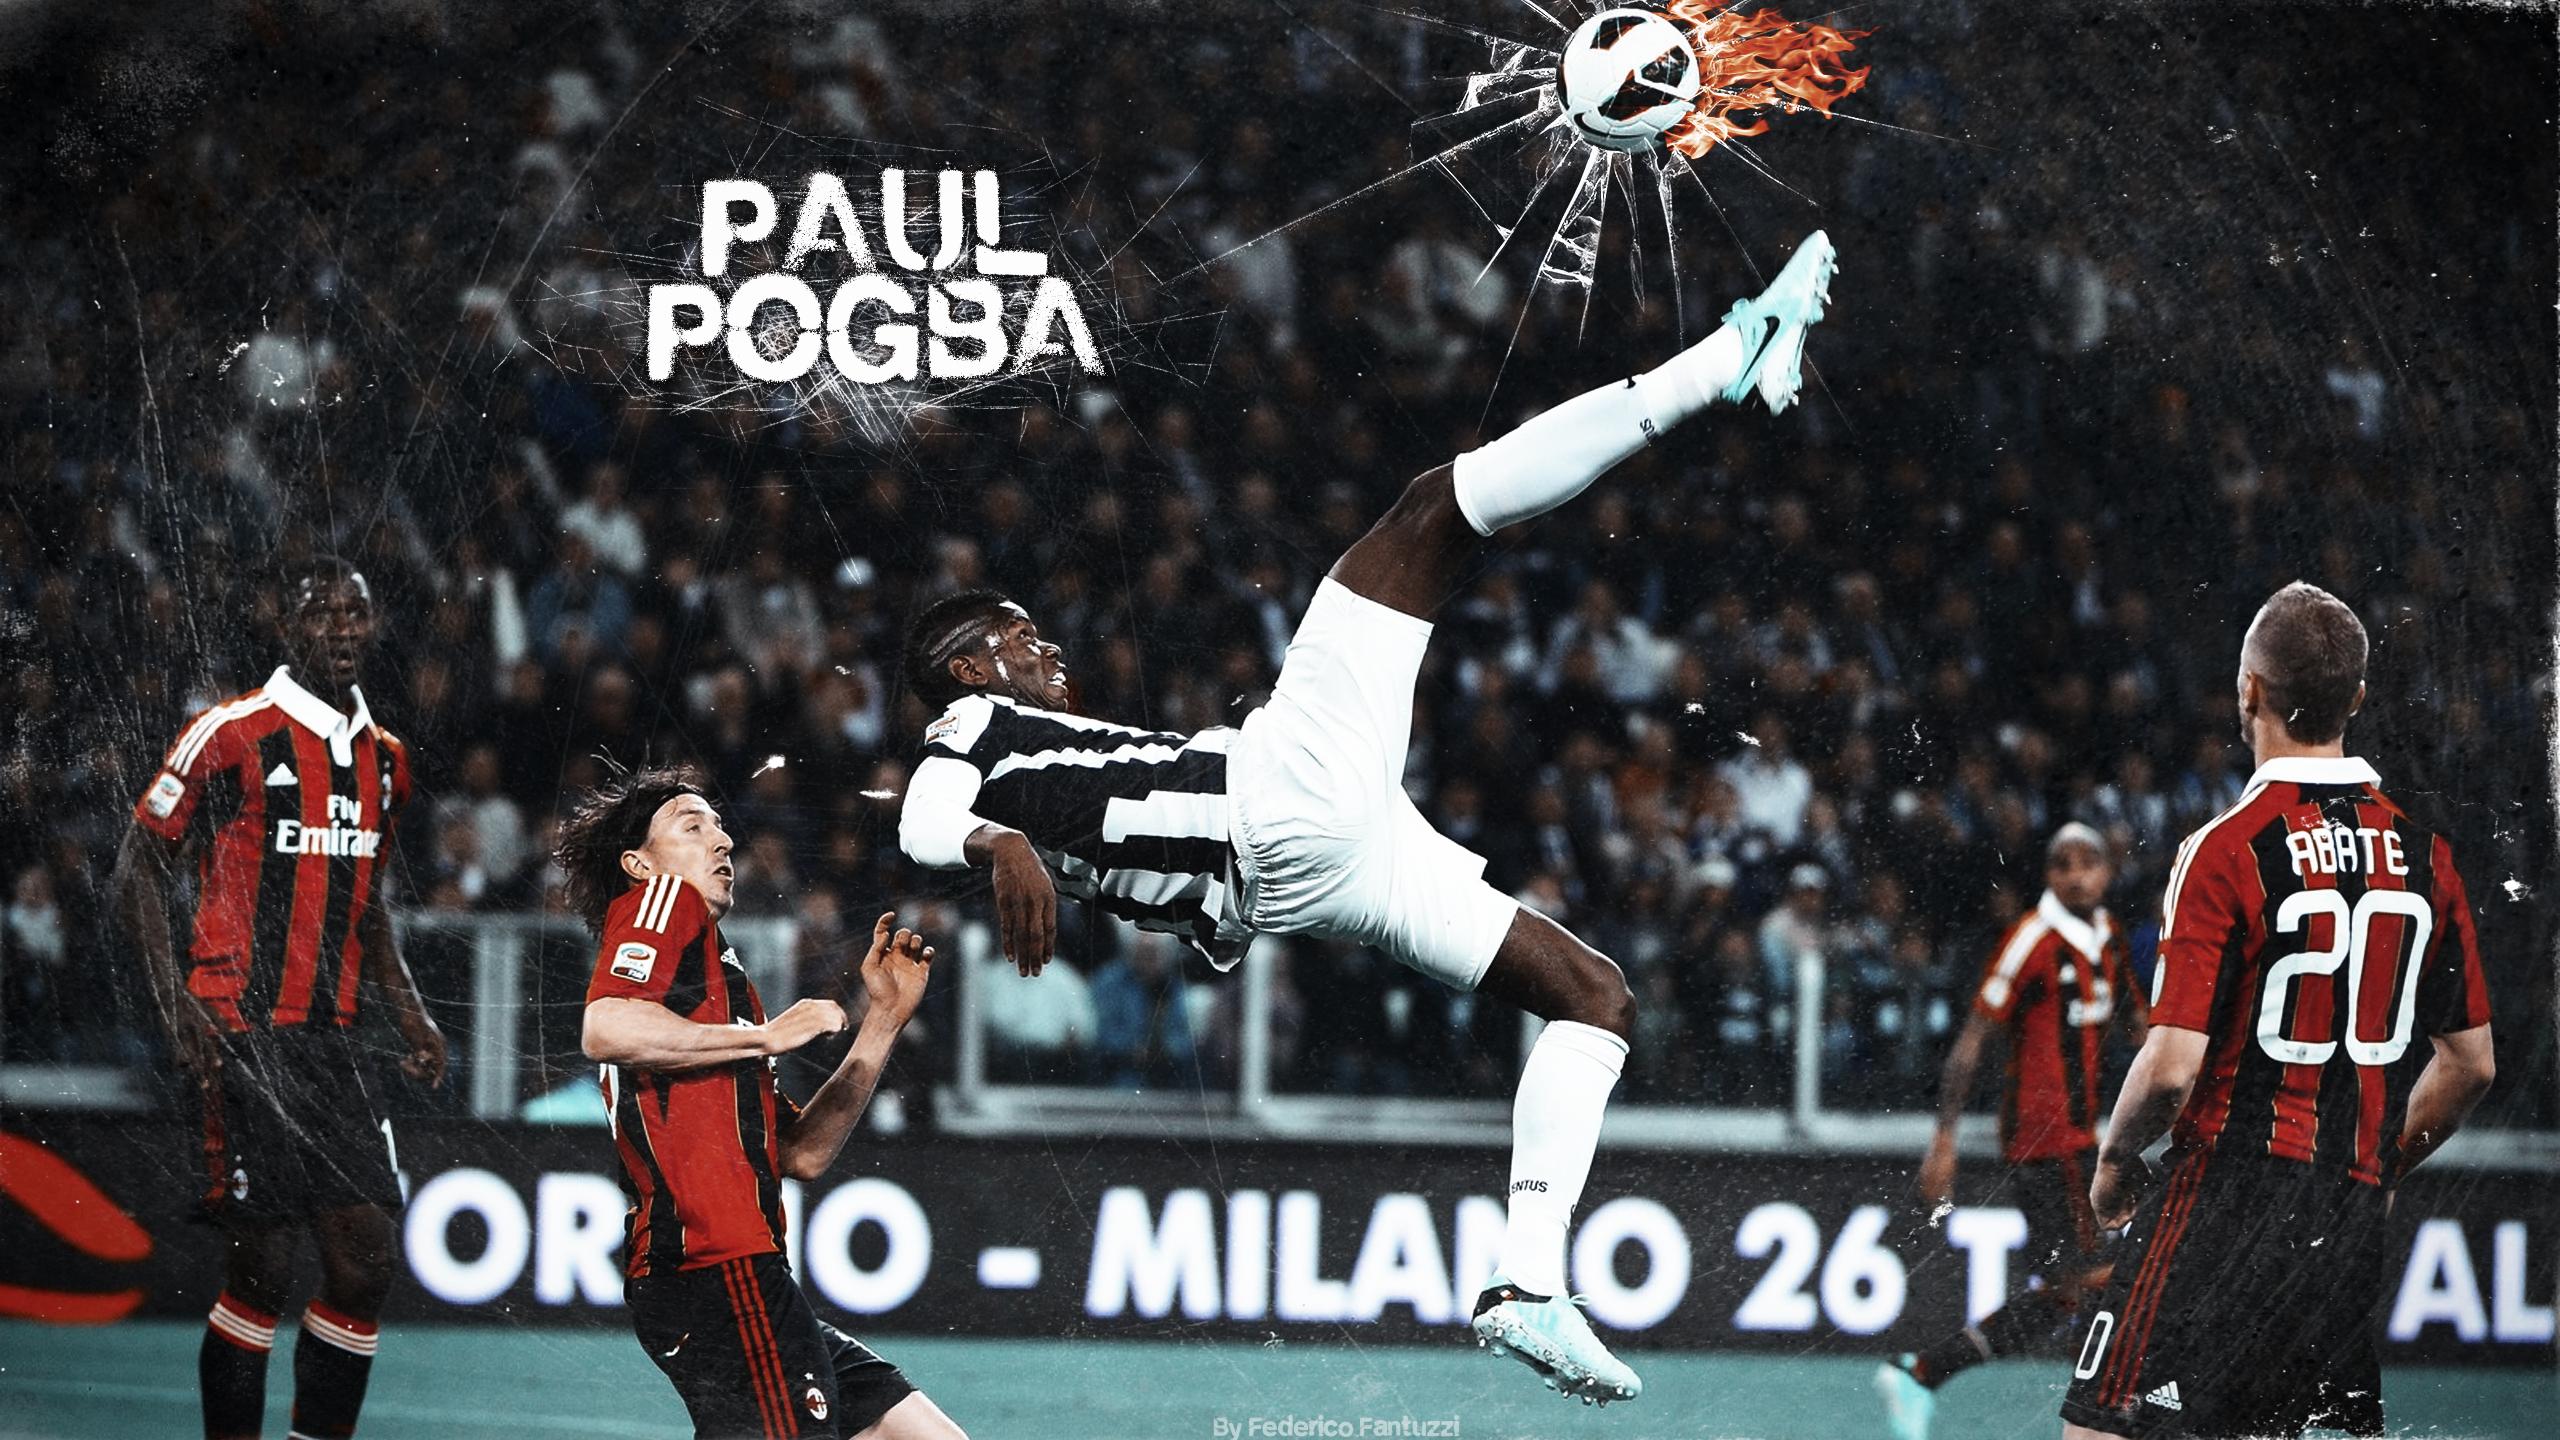 Paul Pogba Wallpaper By SentonB On DeviantArt